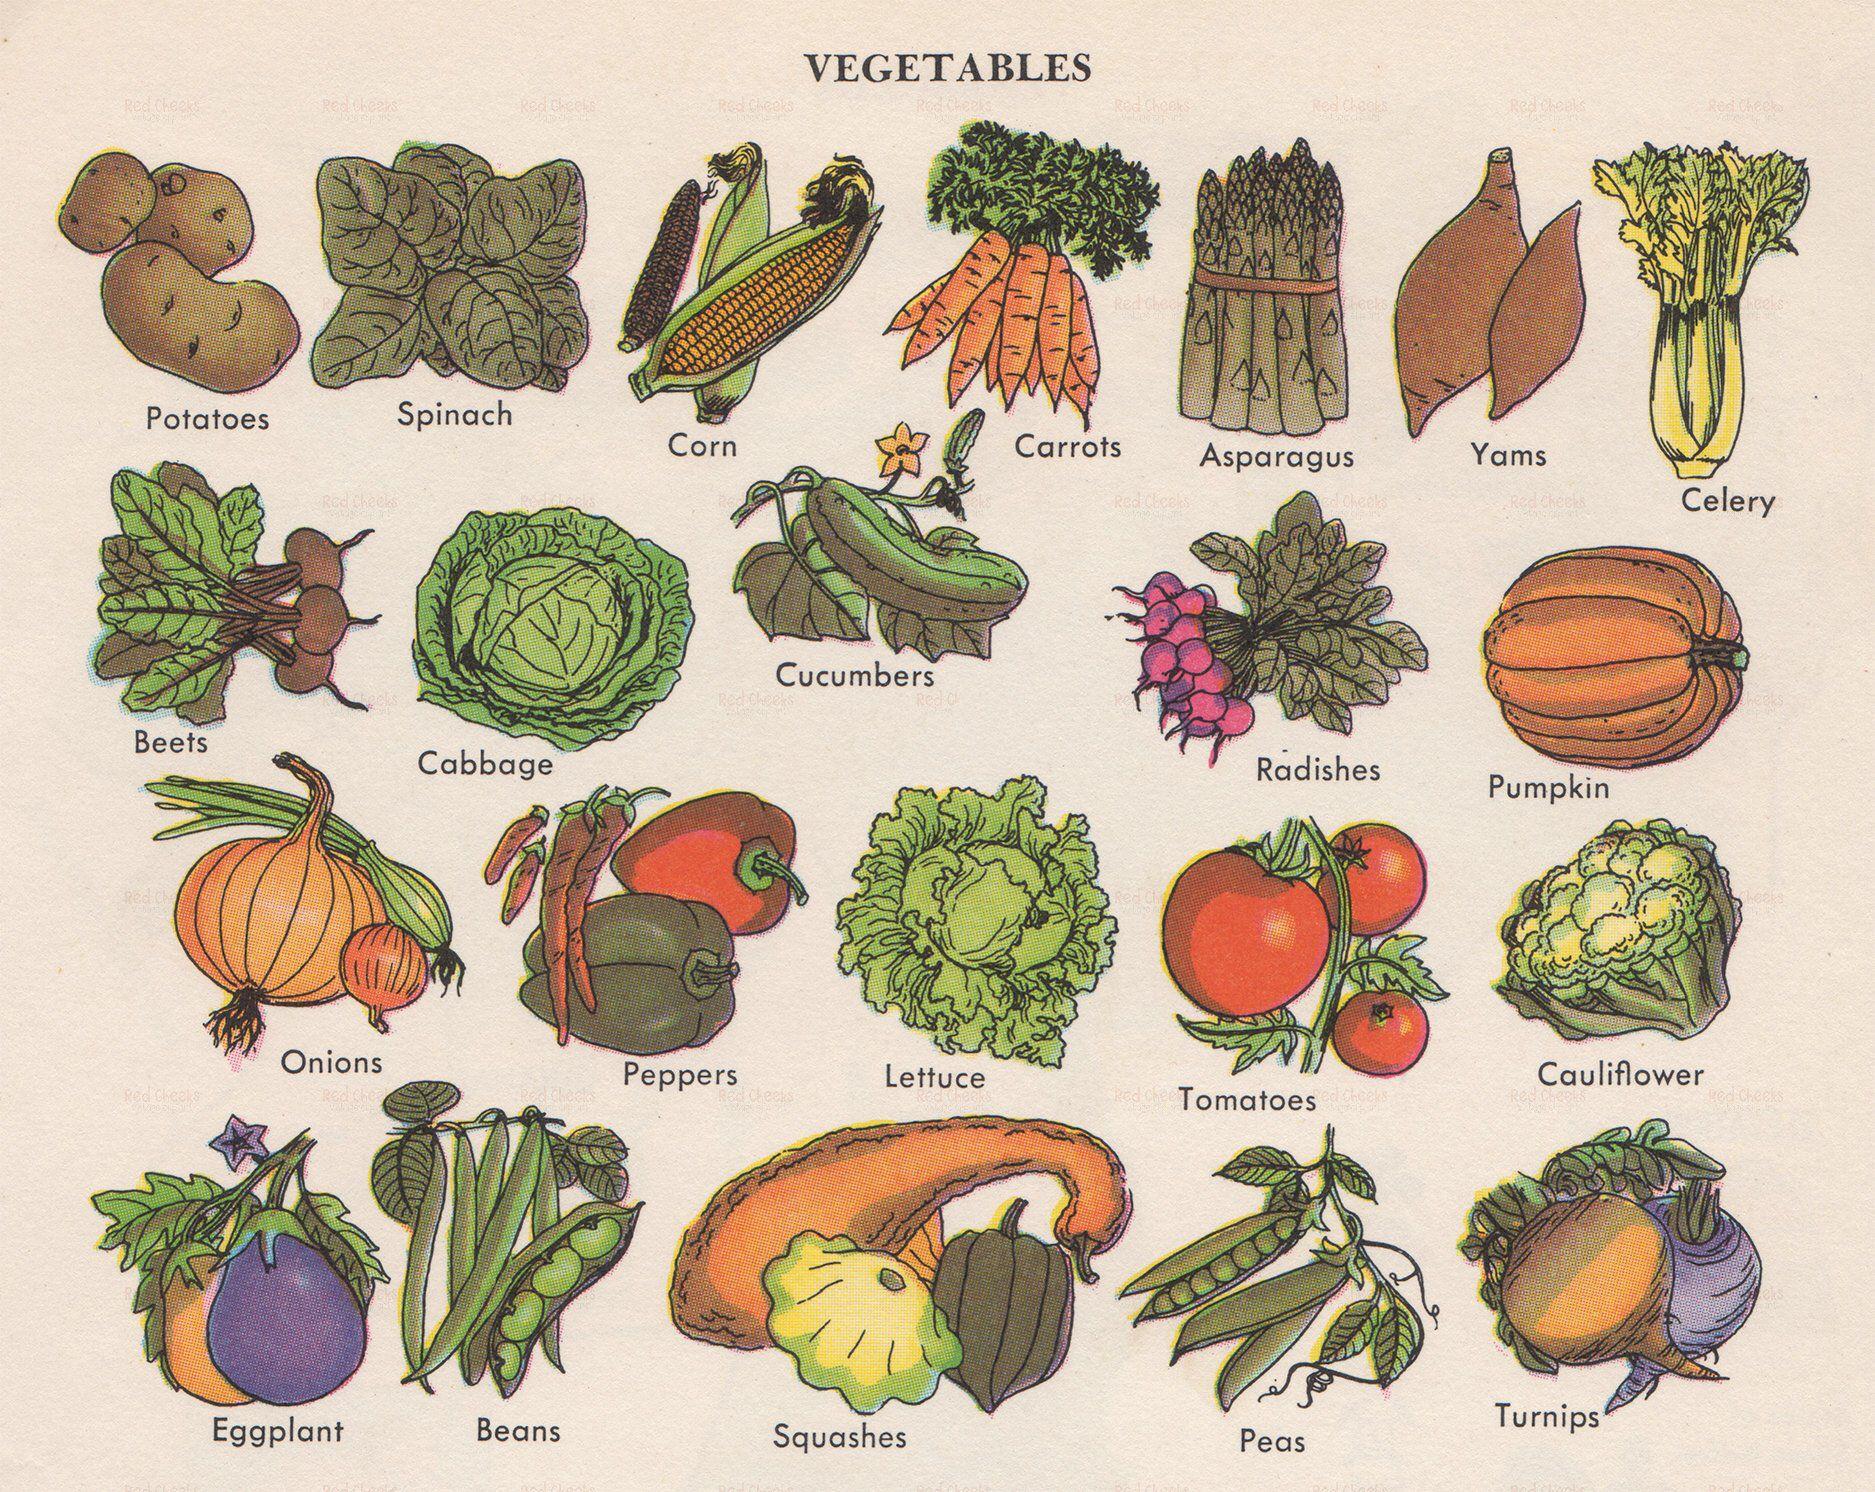 45c60227b74ac Digital Download of Vintage Vegetables Veggies Food Fresh Decor ...